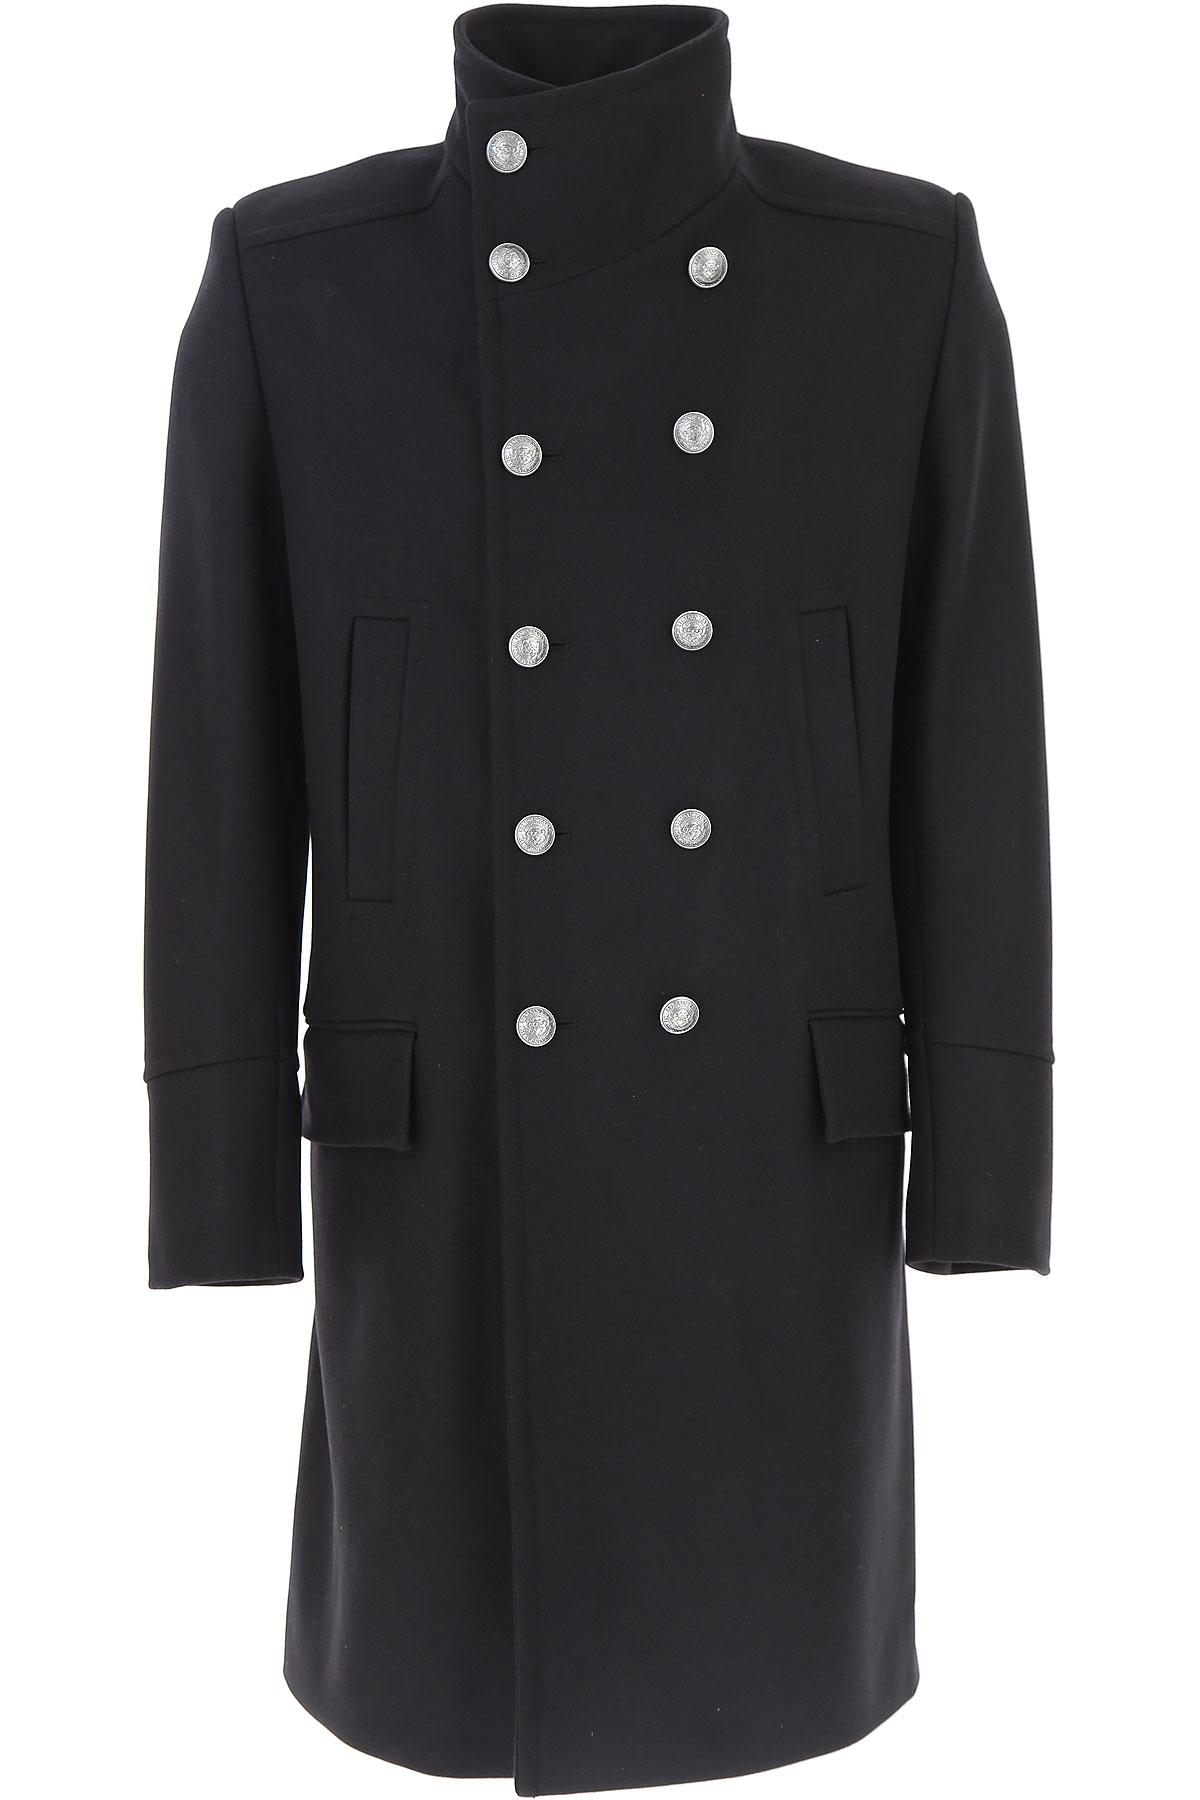 Image of Balmain Men\'s Coat, Black, Wool, 2017, L XL XXL